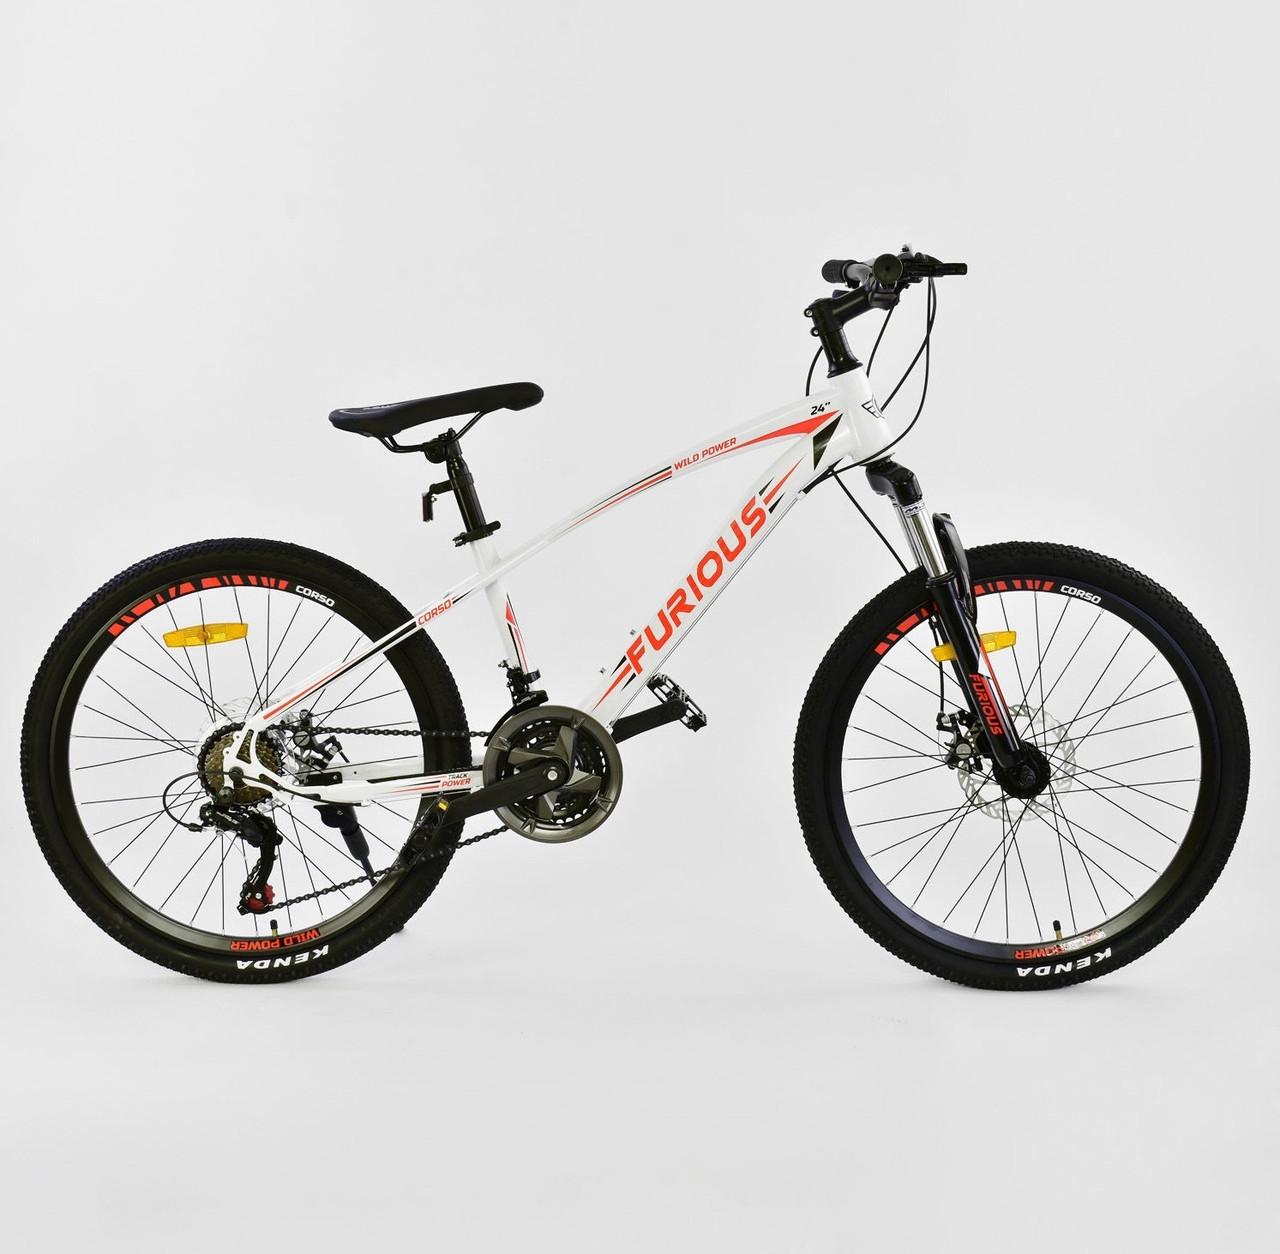 "Corso Велосипед Corso 24"" Furious White / Red (JYT 009 - 9983)"